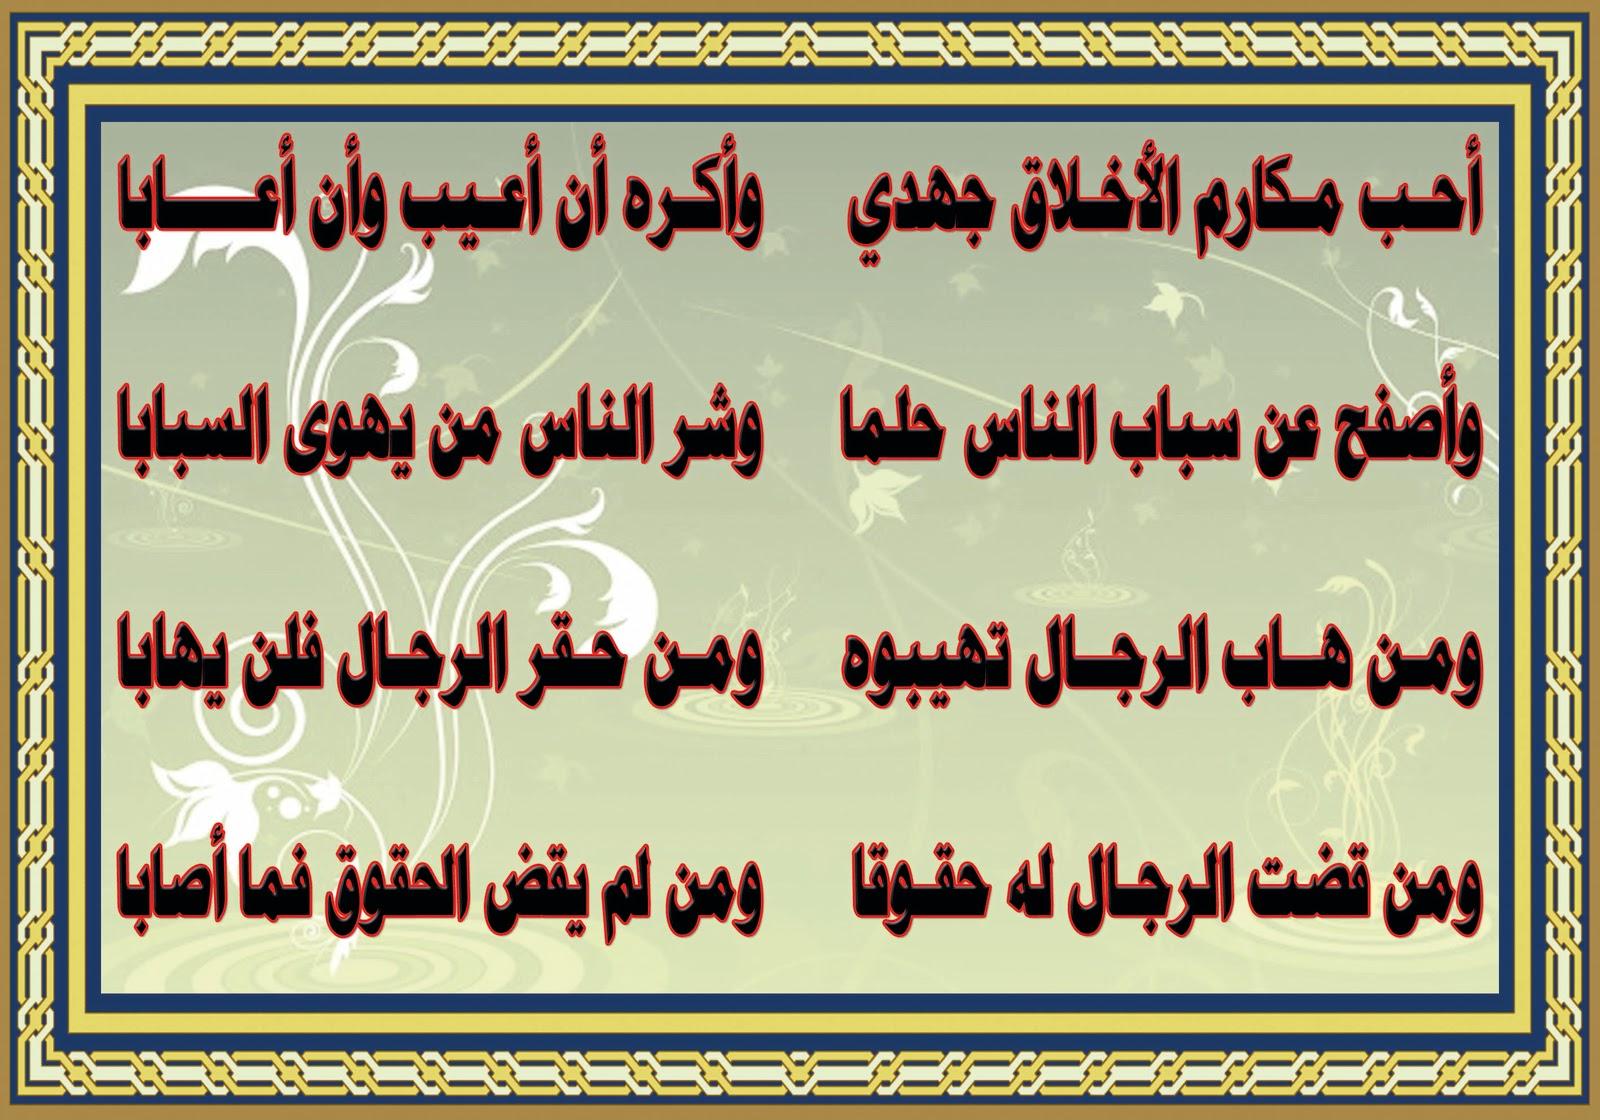 بالصور ابيات شعر مدح , اجمل ما يقال فى مدح من نحب 4924 10